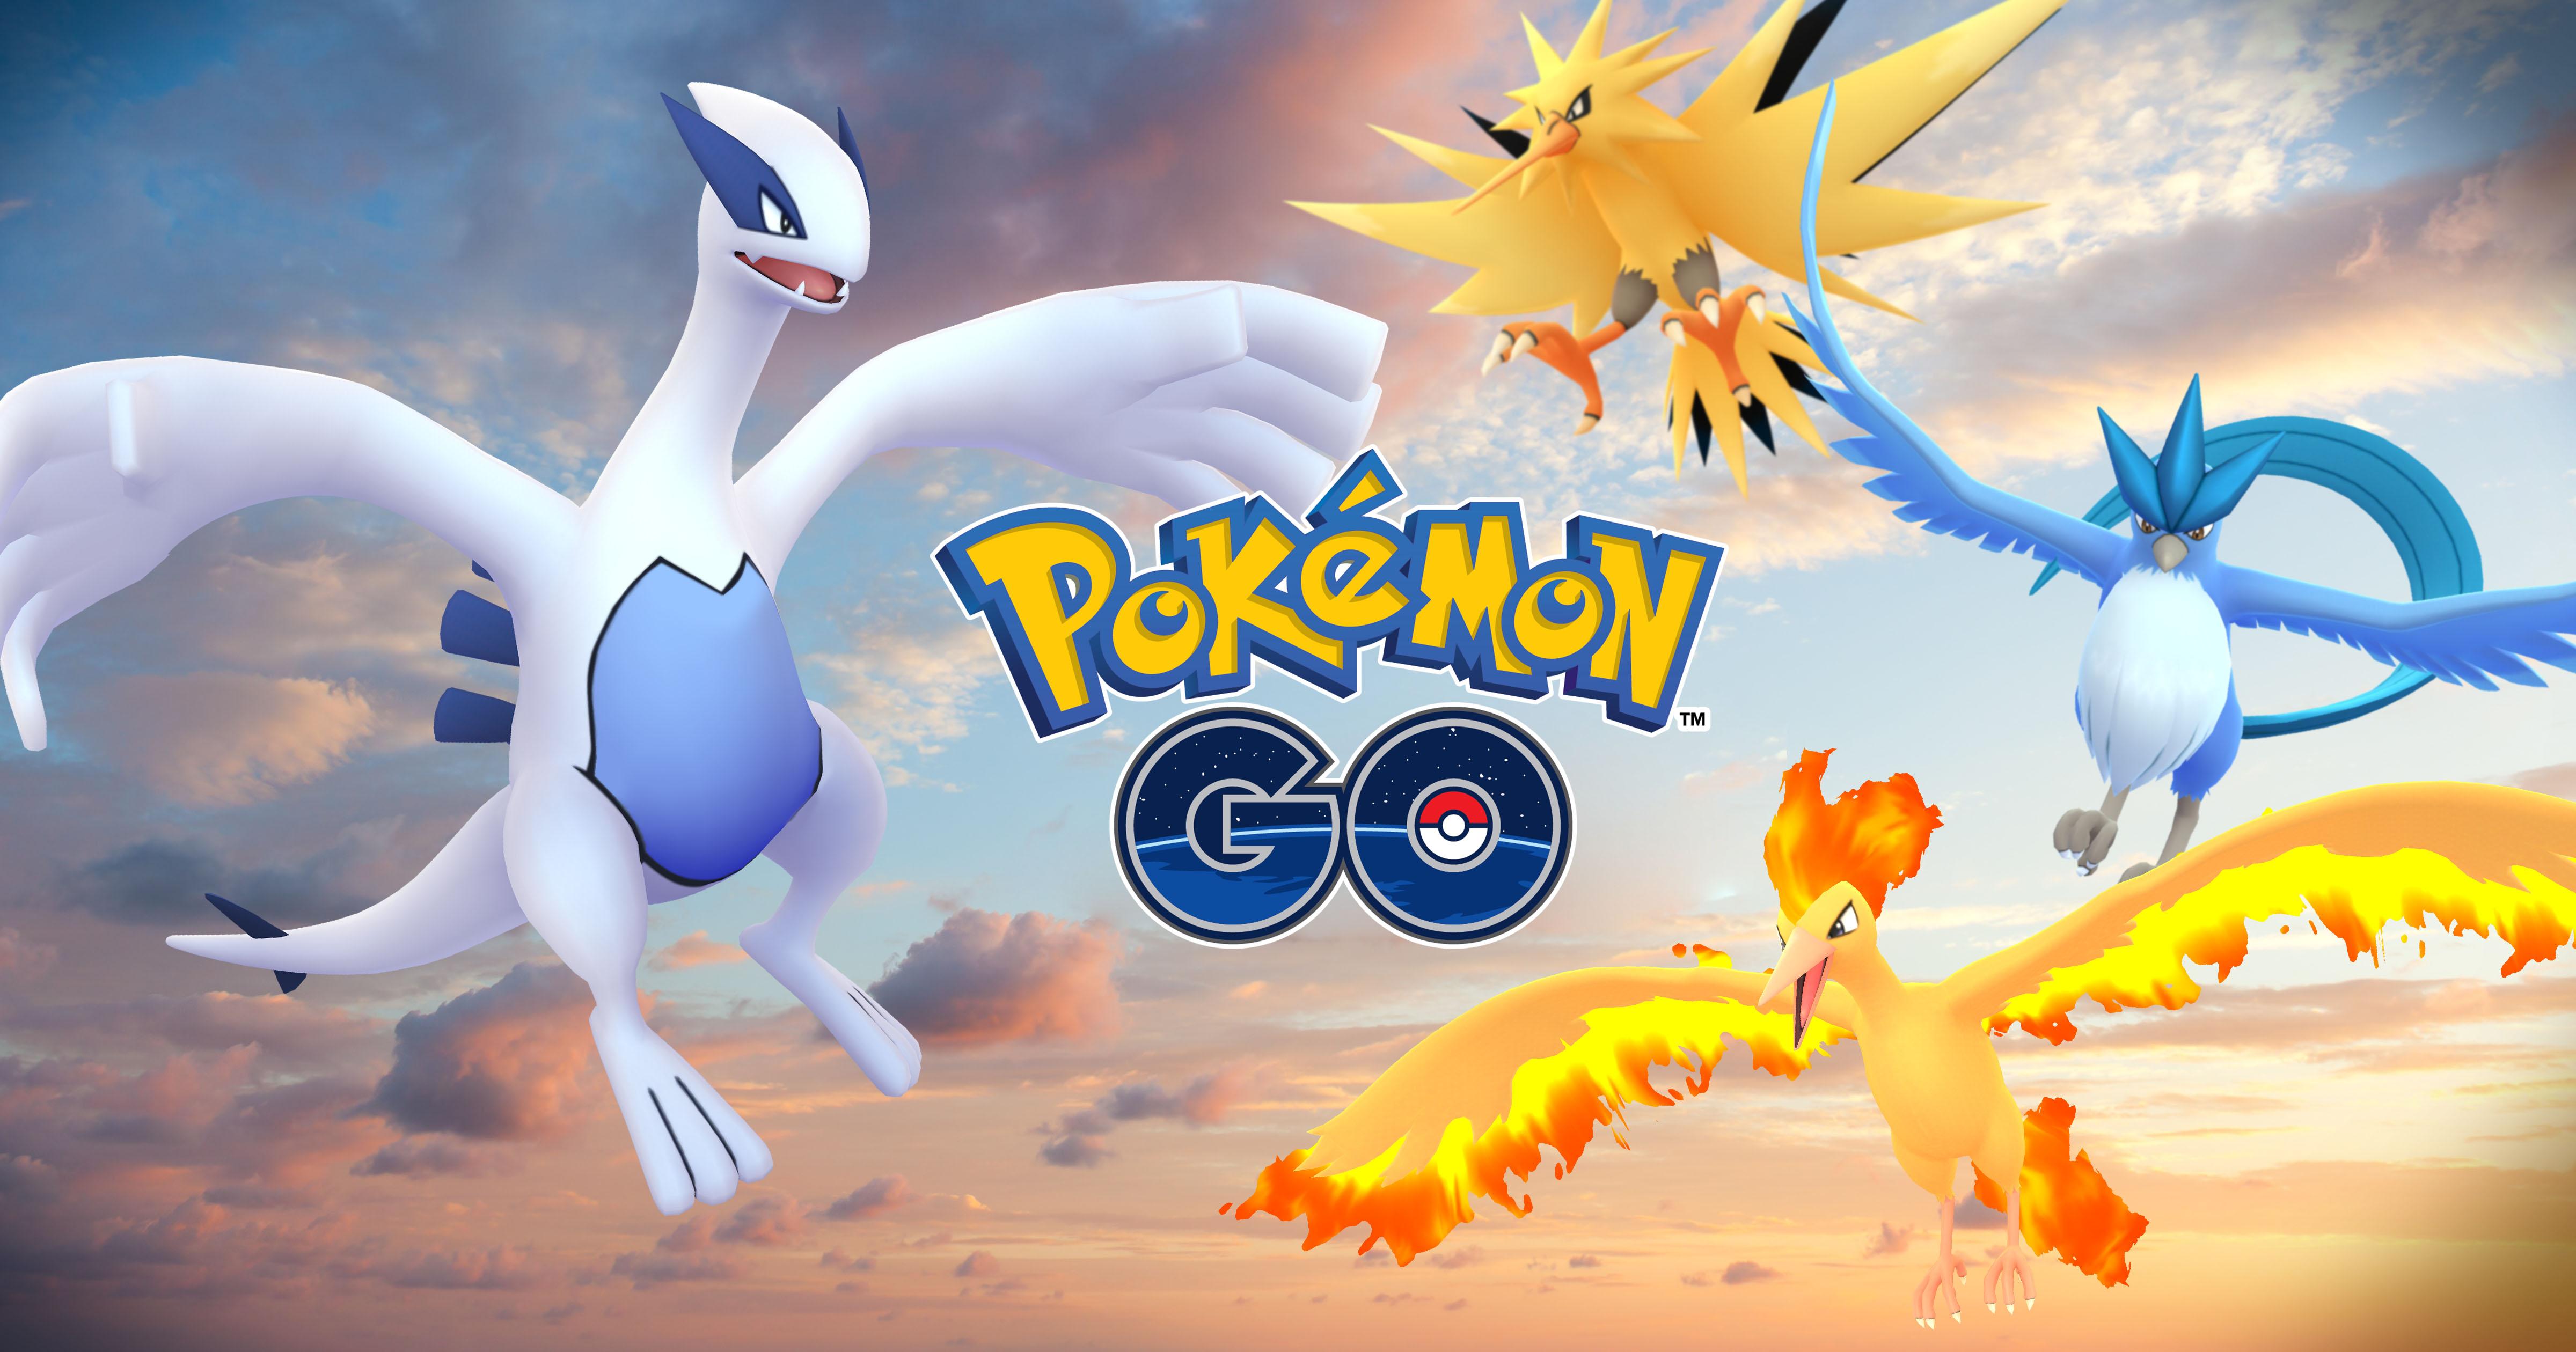 pokémon go』伝説のポケモン「ルギア」「フリーザー」が世界各地で出現